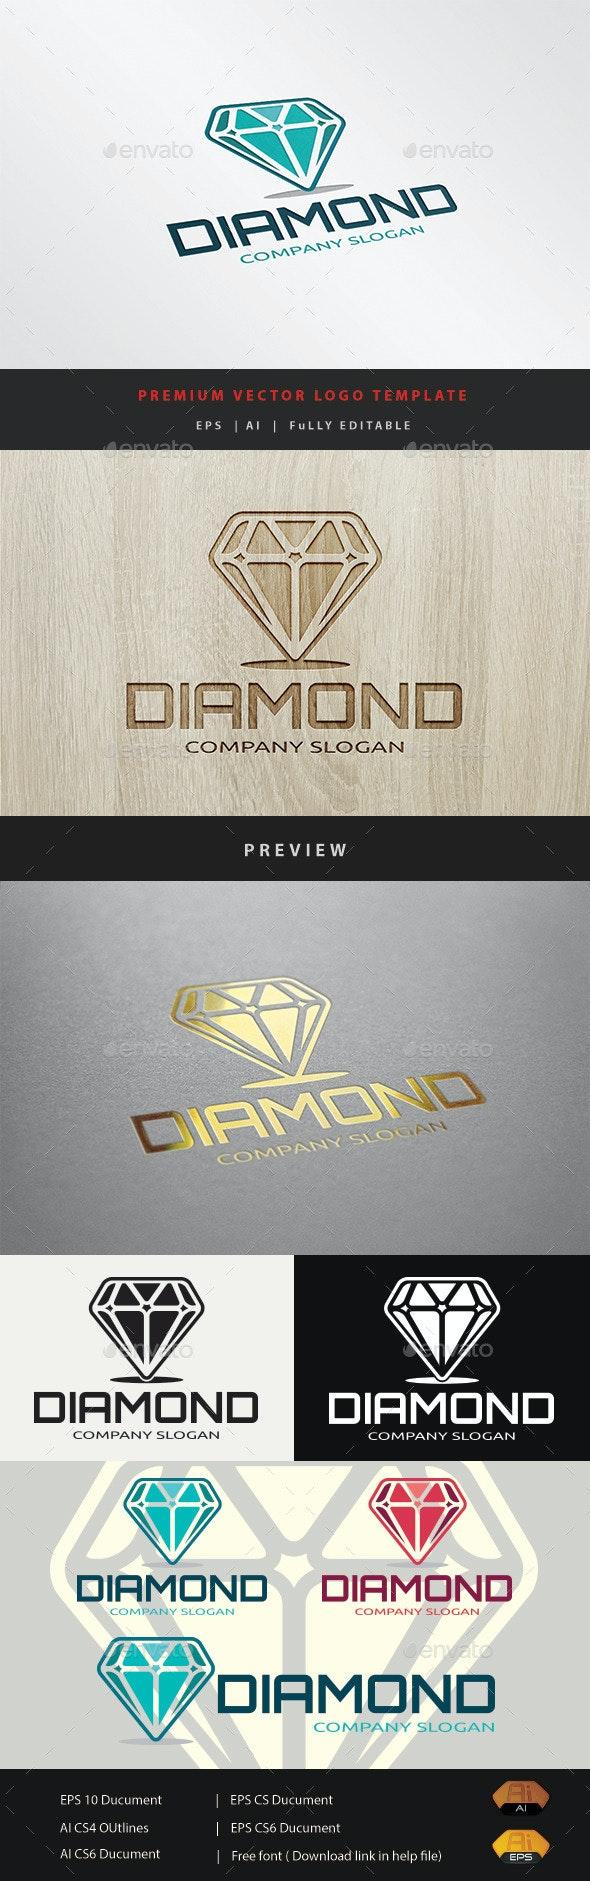 Diamond - Objects Logo Templates